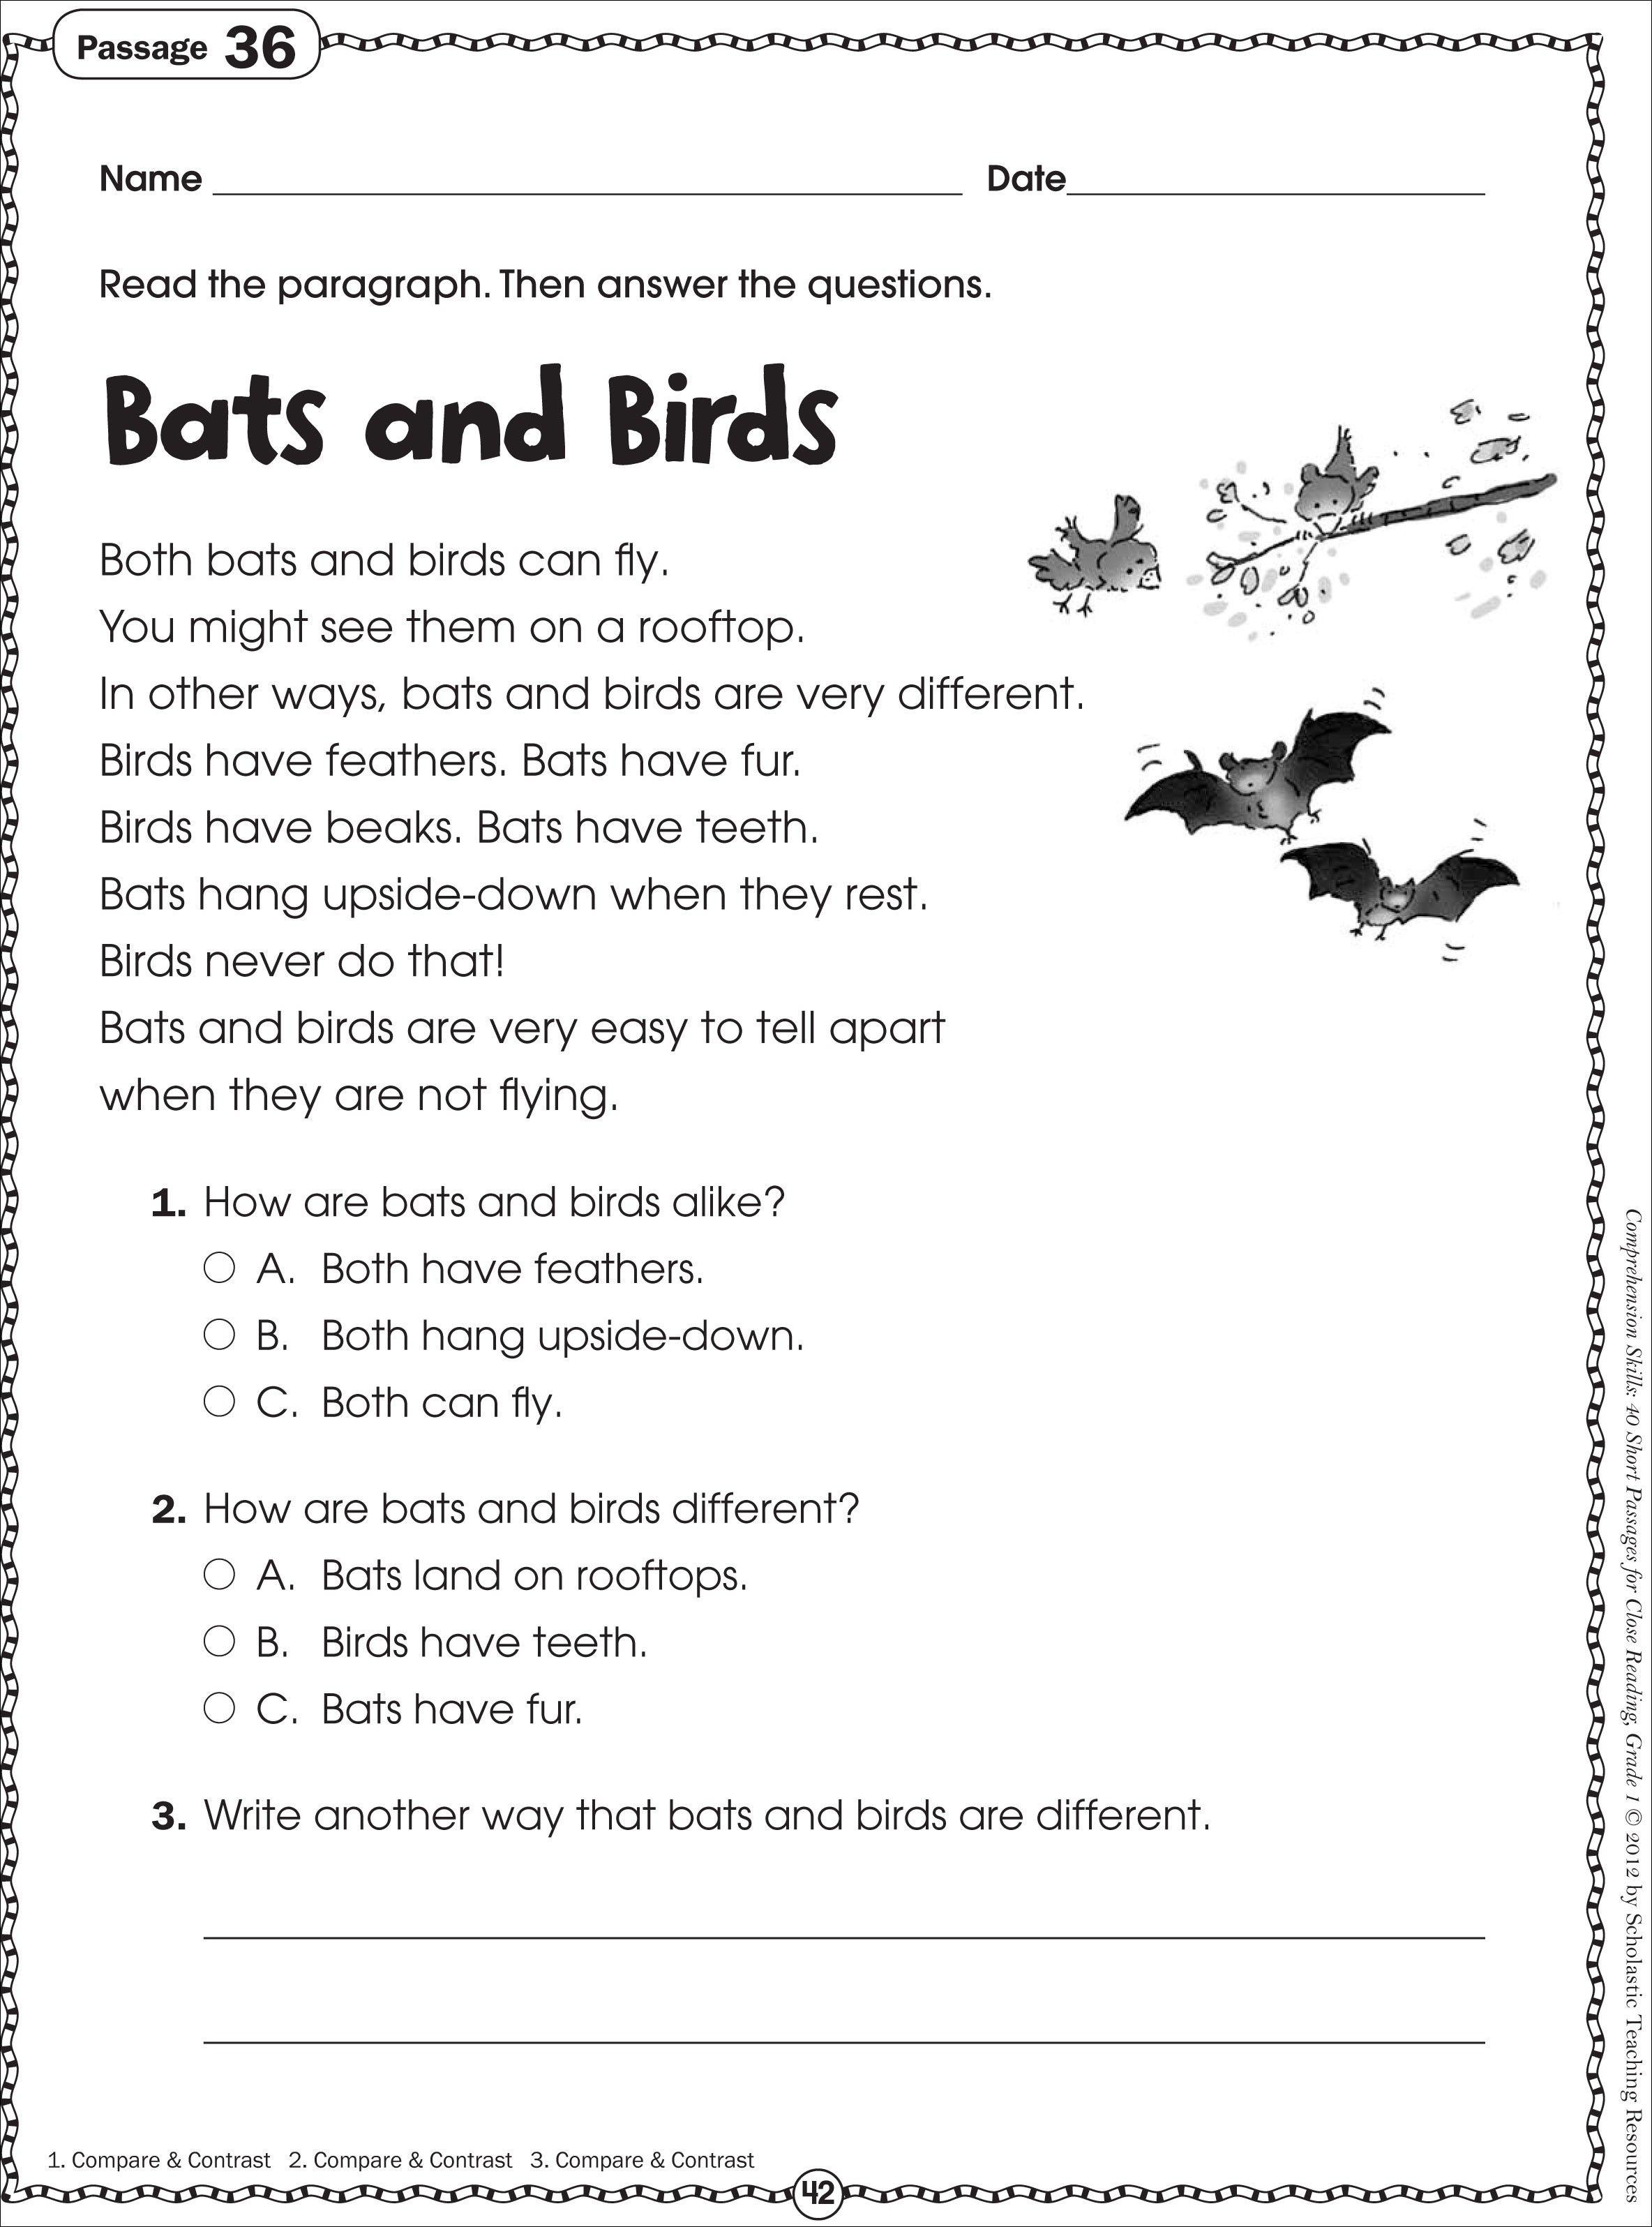 Free Printable Reading Comprehension Worksheets For Kindergarten - Third Grade Reading Worksheets Free Printable